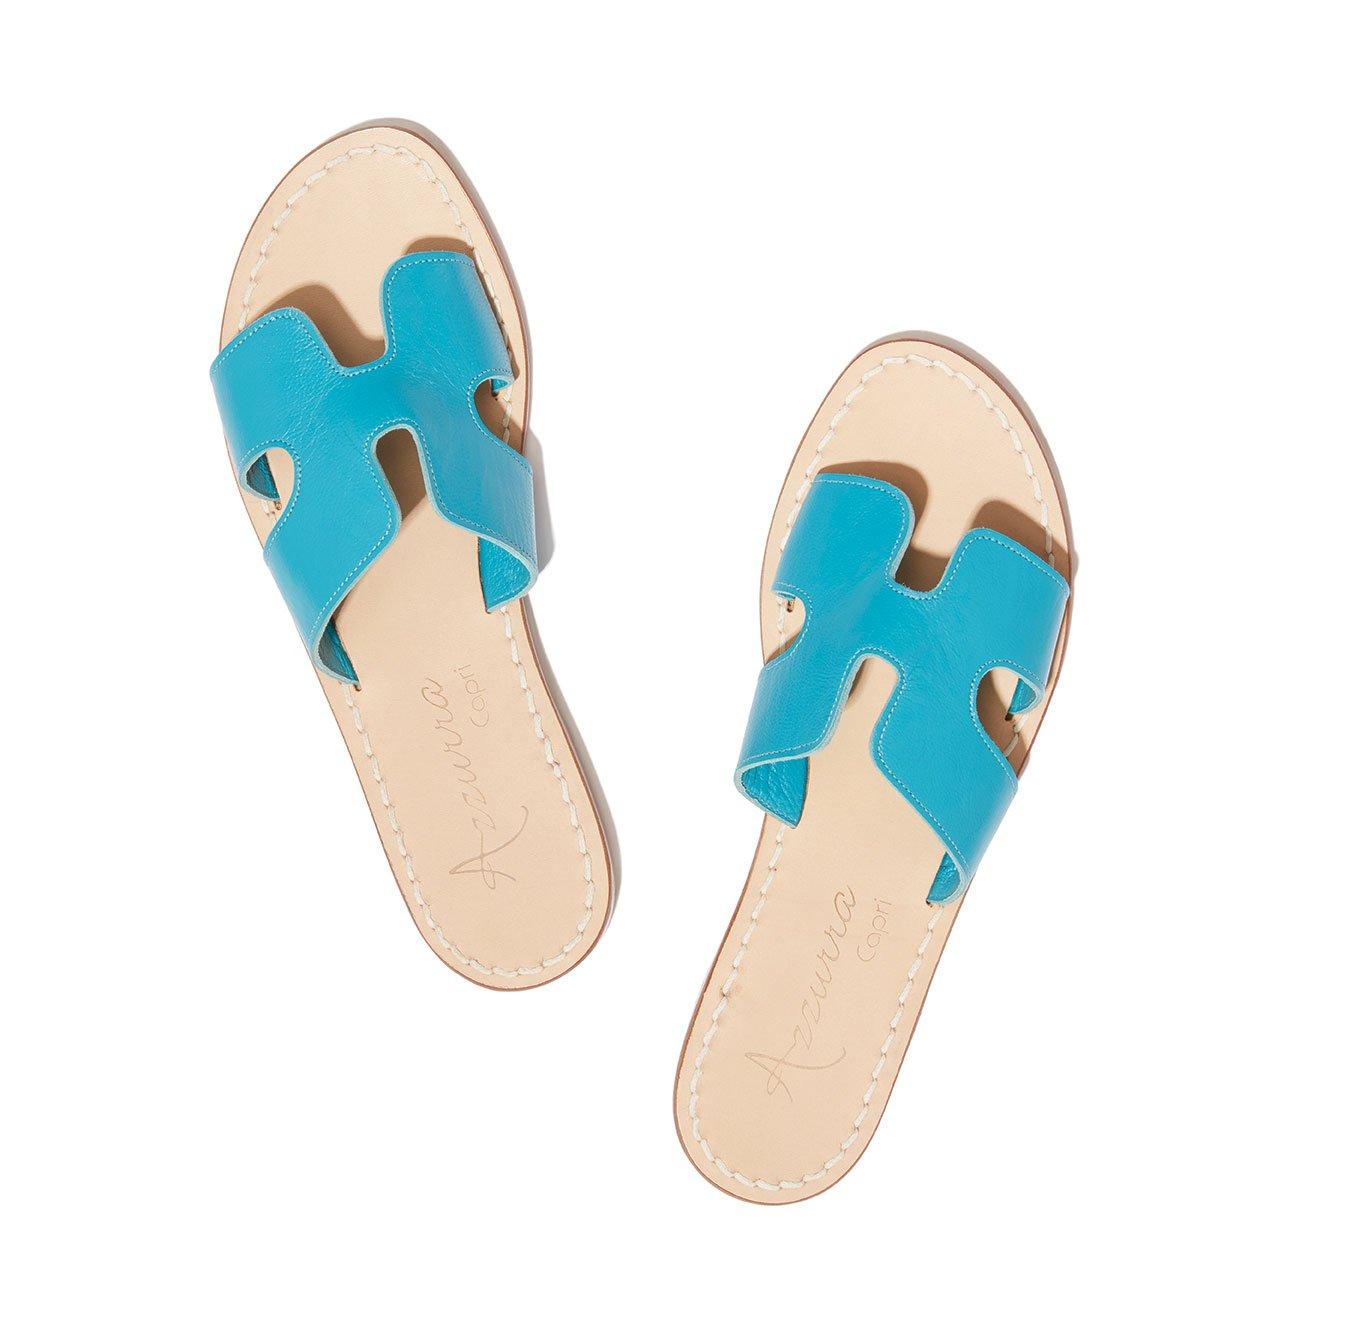 azzurra capri little itally san diego sandals boutique